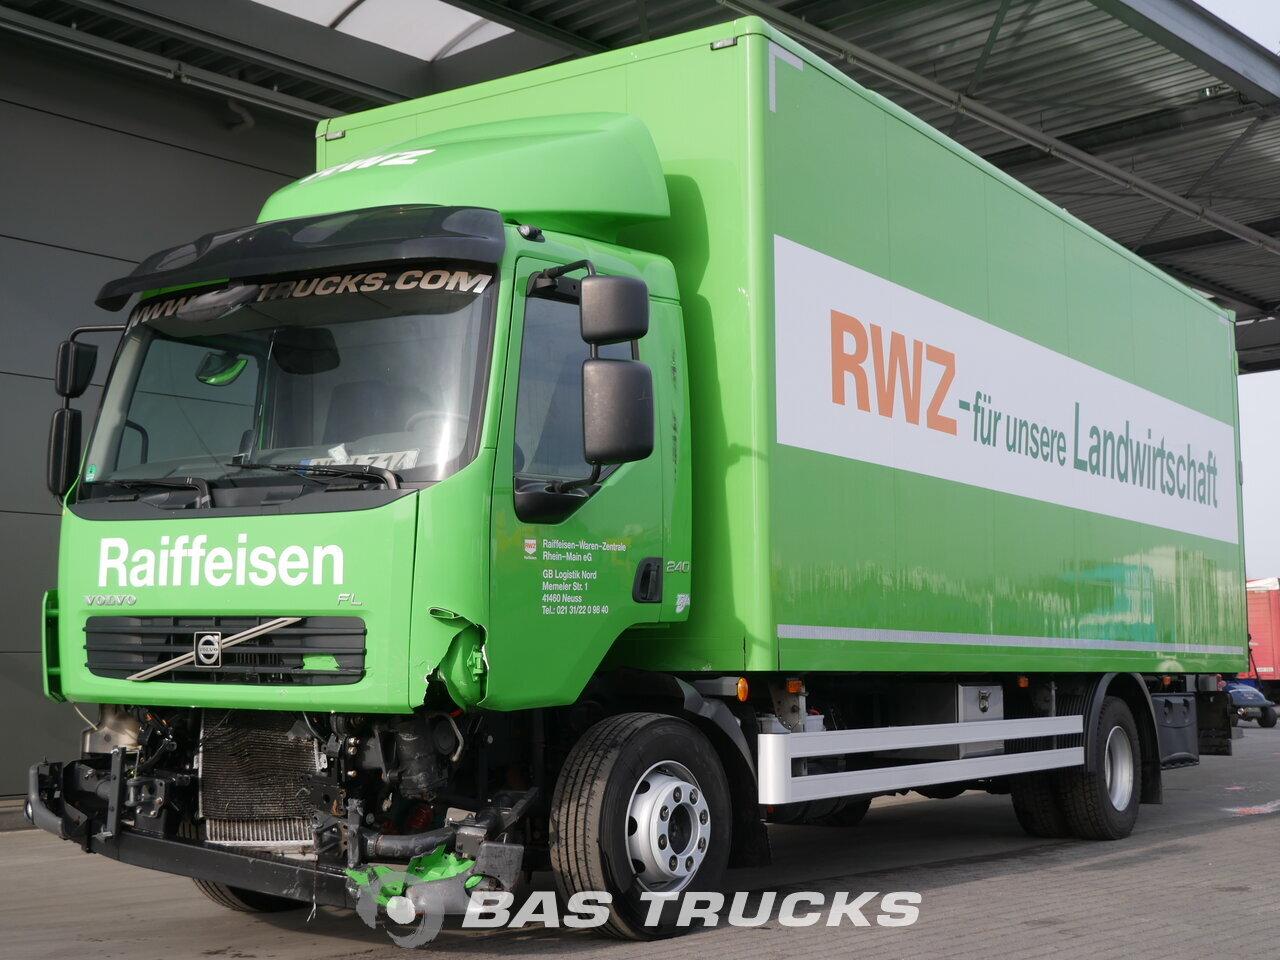 For sale at BAS Trucks: Volvo FL 240 Unfall Fahrbereit 4X2 01/2013